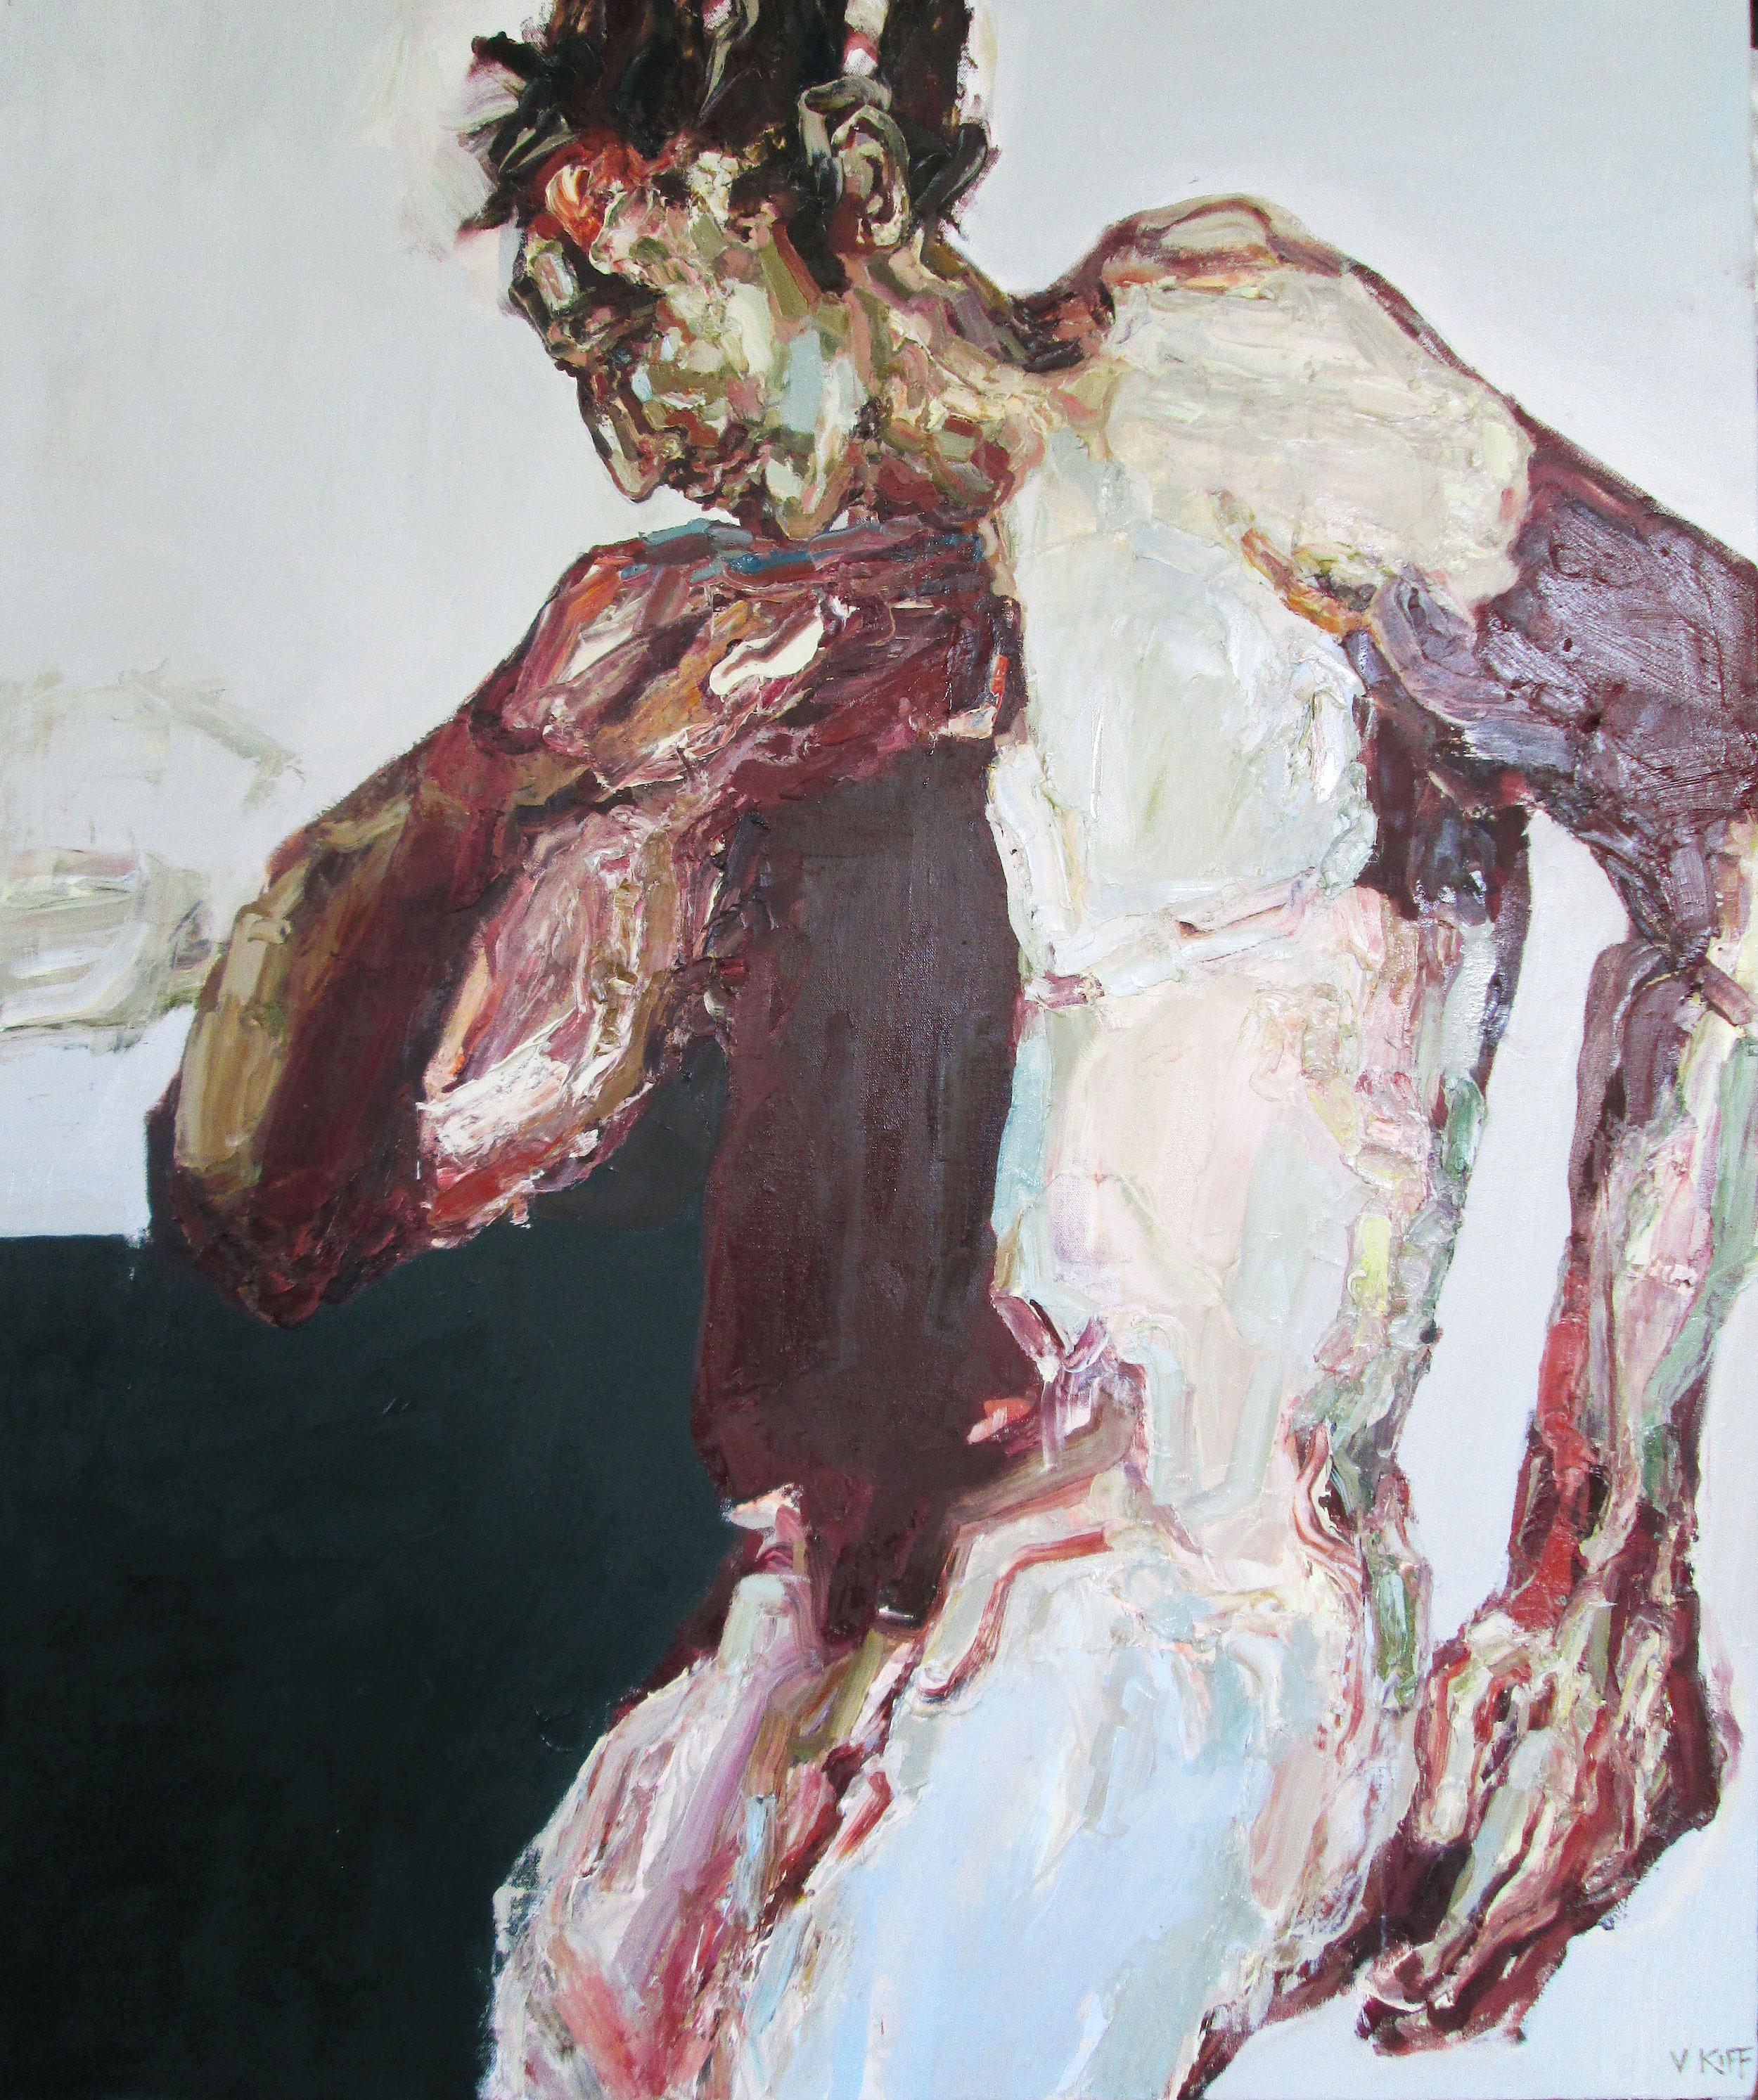 Title: Partial Eclipse  Size: 125 x 105 cm  Medium: Oil on canvas  Price: £4500